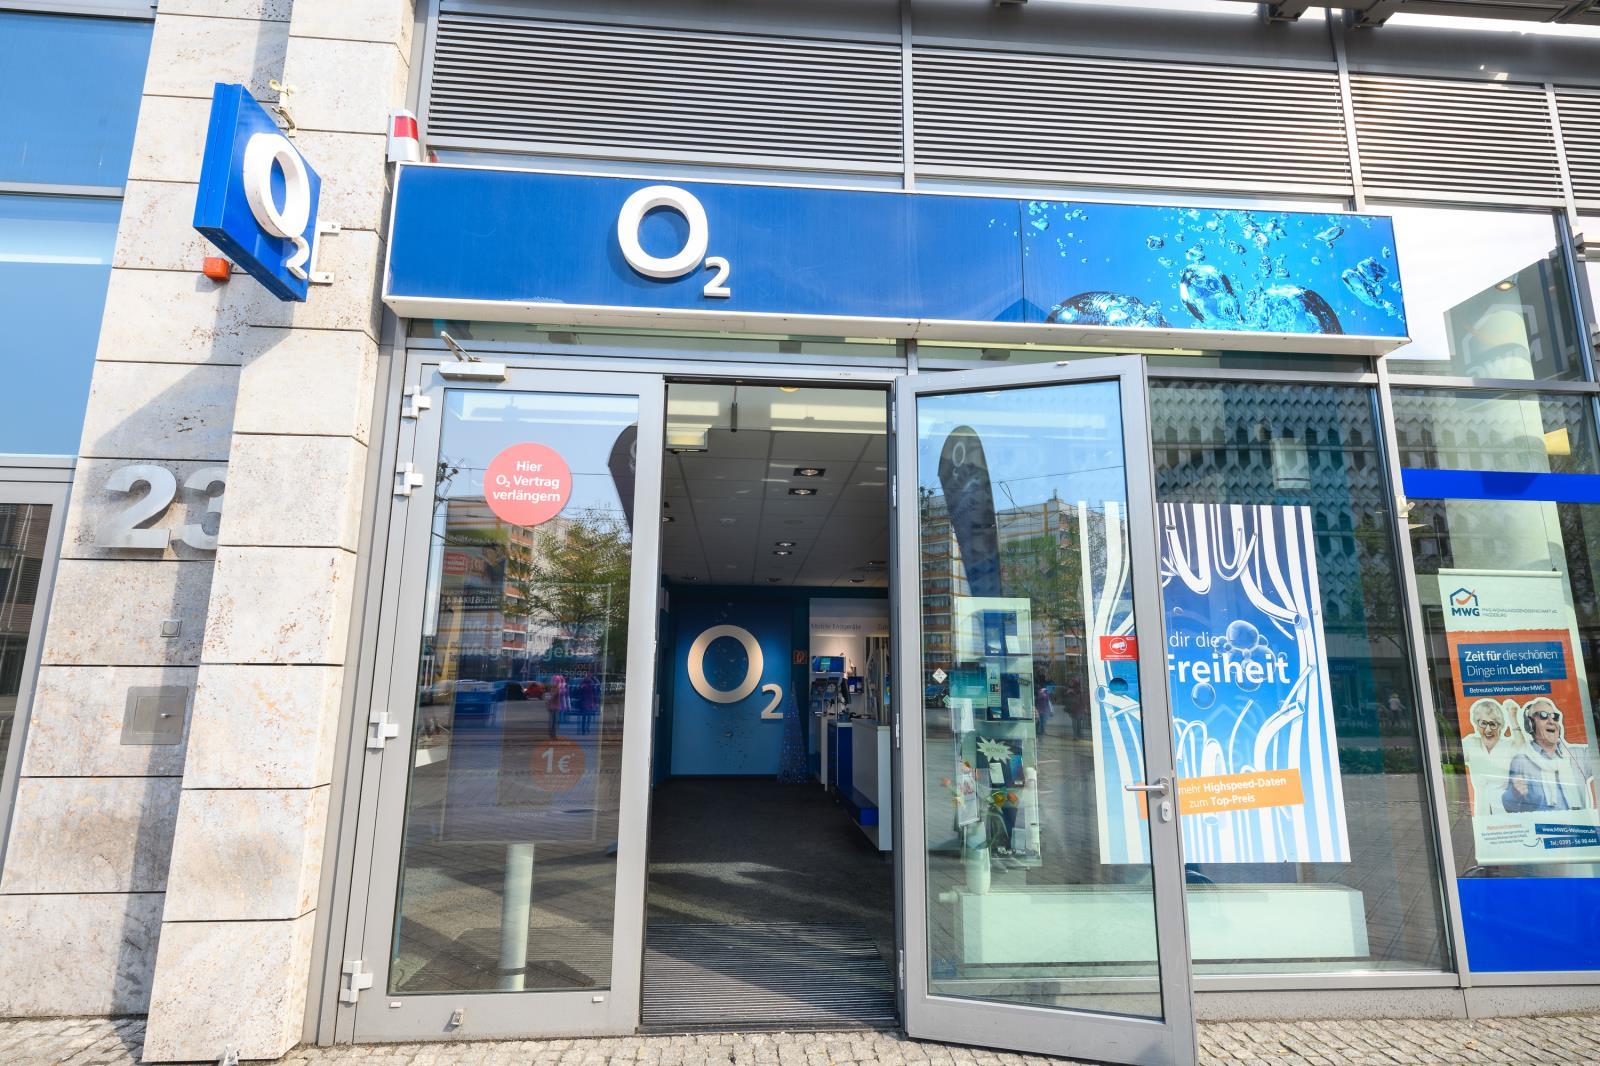 o2 Shop, Breiter Weg 23-26 in Magdeburg